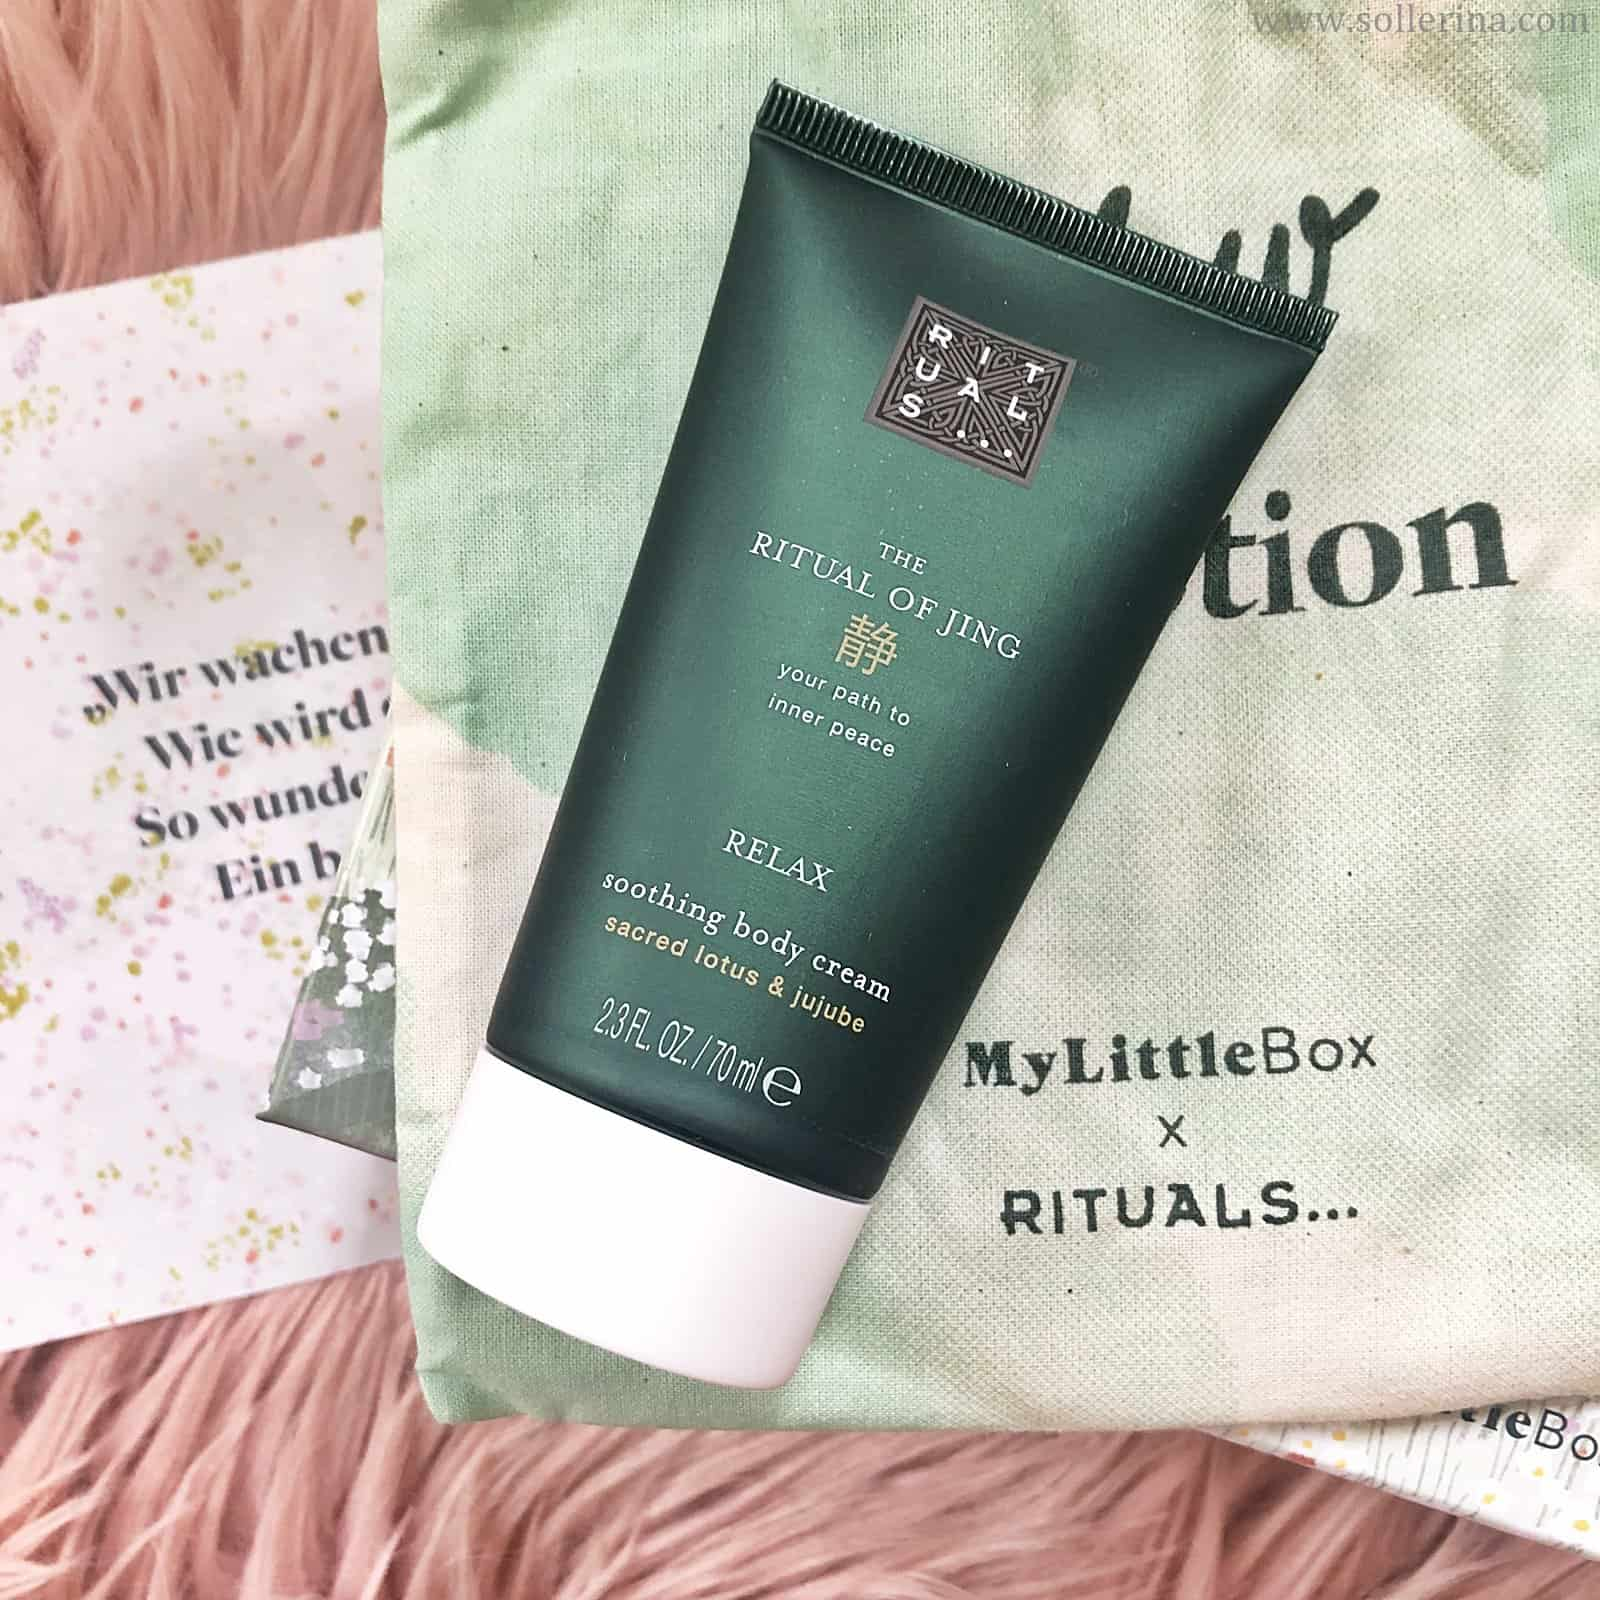 Rituals – The Ritual of Jing – Soothing Body Cream